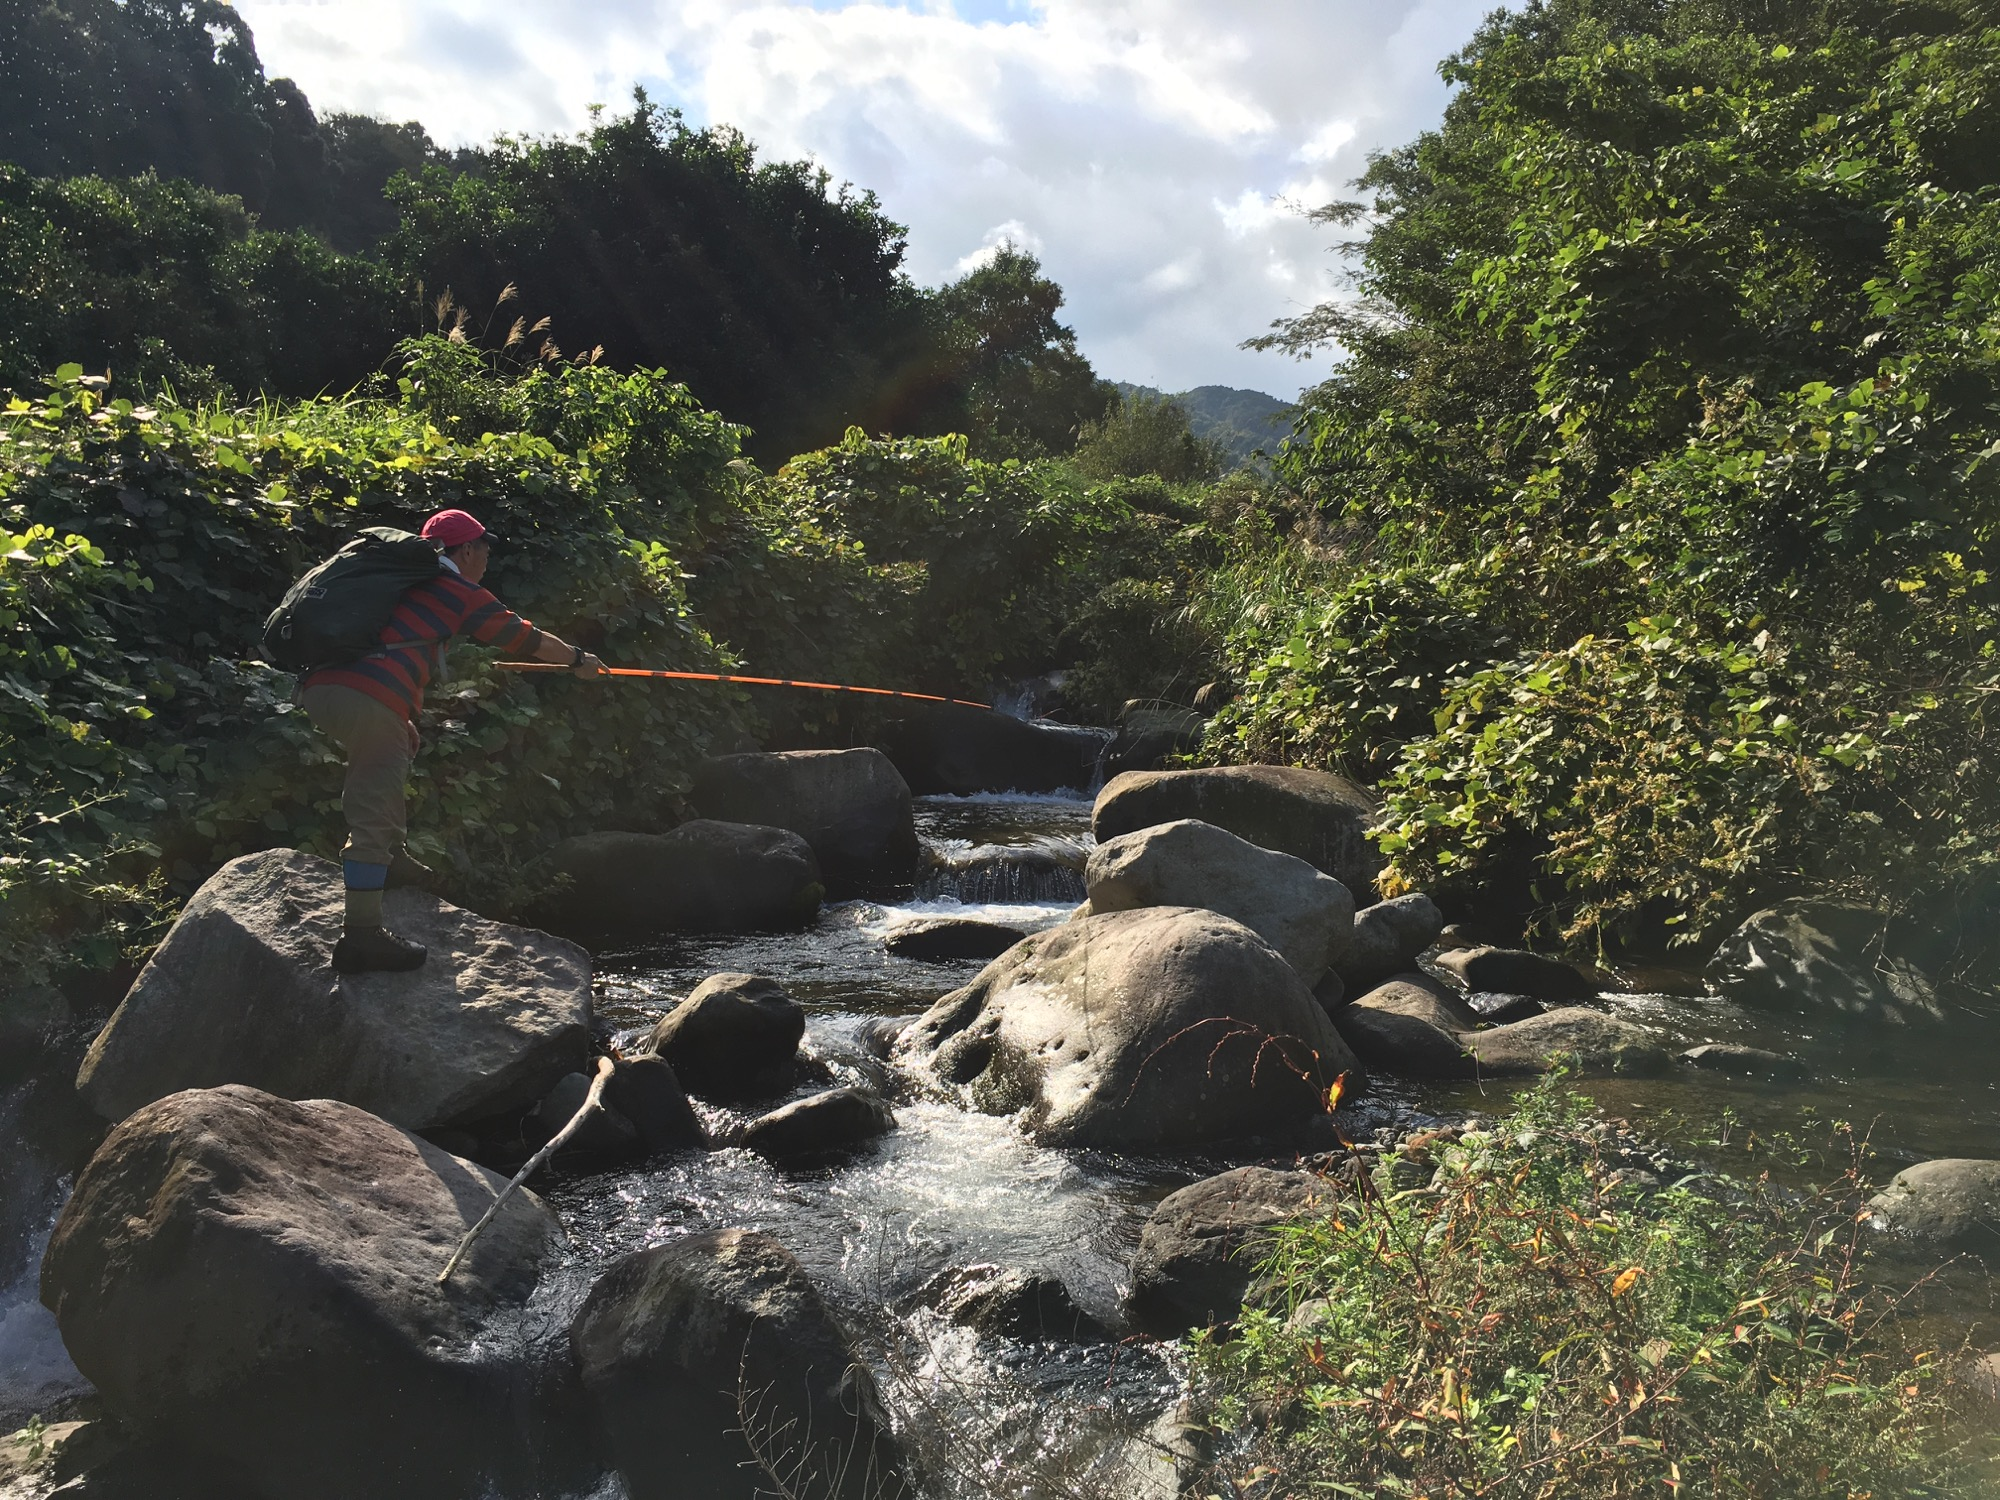 Tenkara fly fishing for spunky Amago trout.